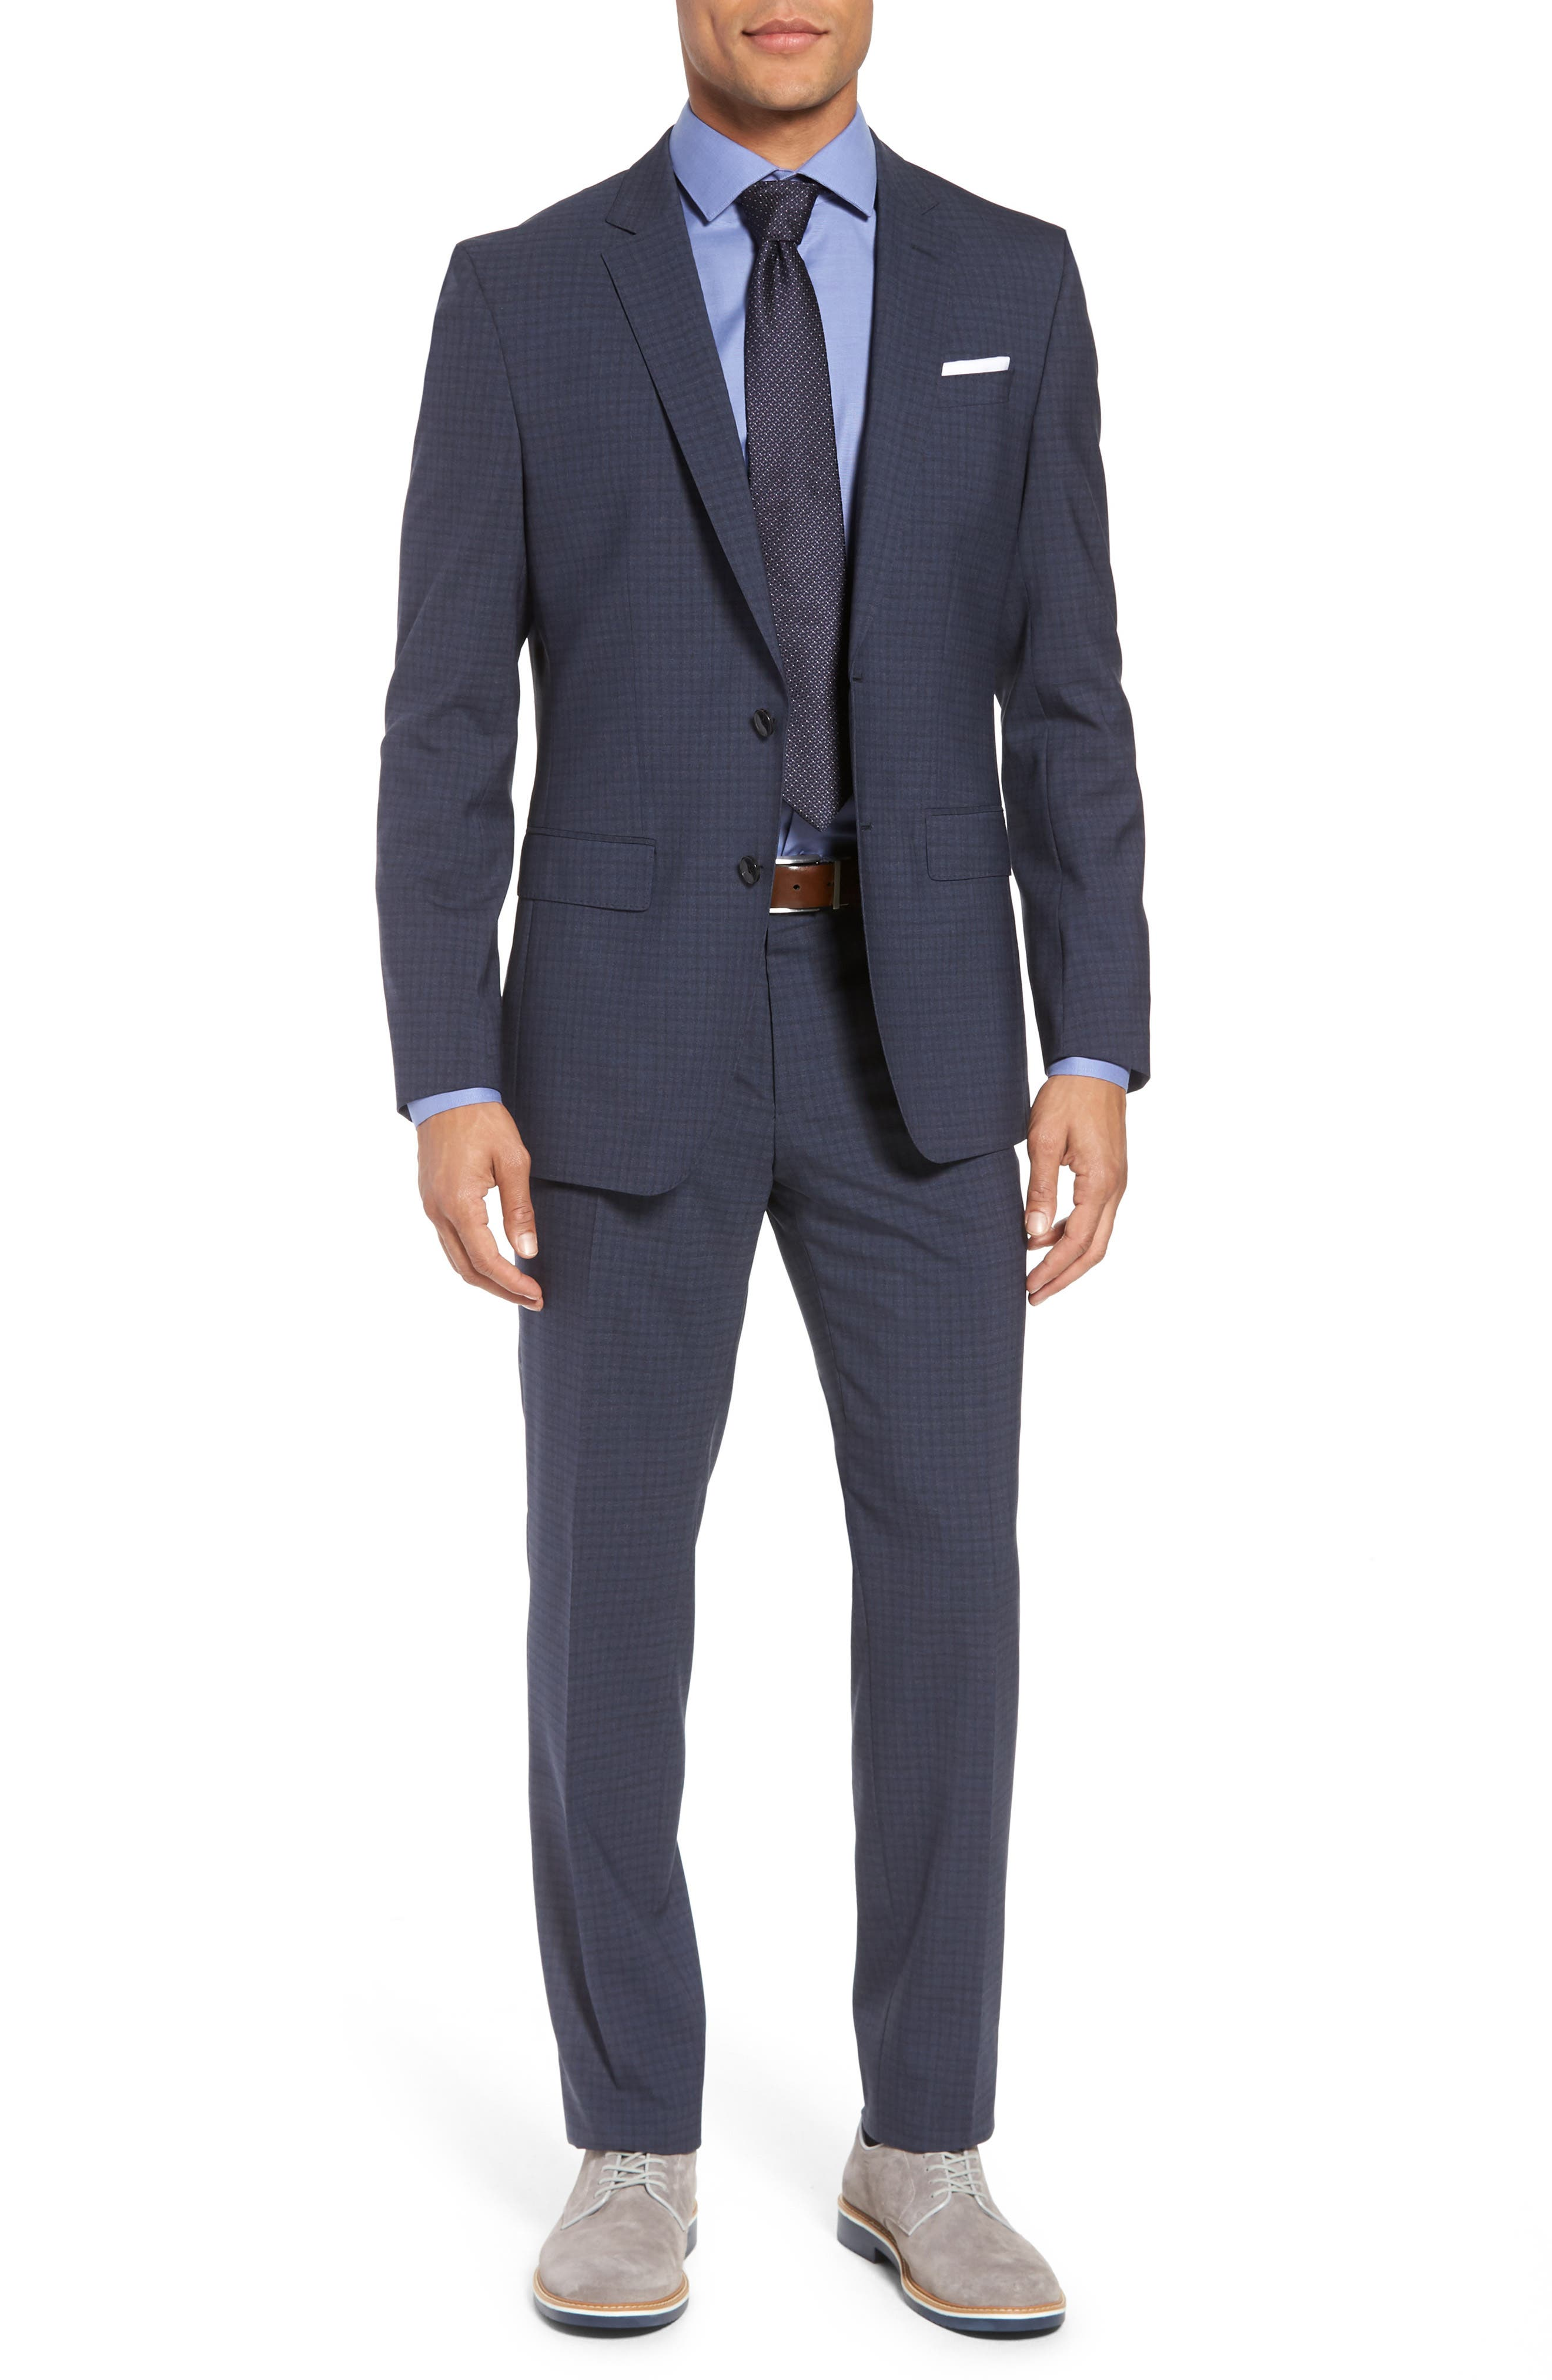 Huge/Genius Trim Fit Check Wool Suit,                             Main thumbnail 1, color,                             Blue/ Brown/ Charcoal